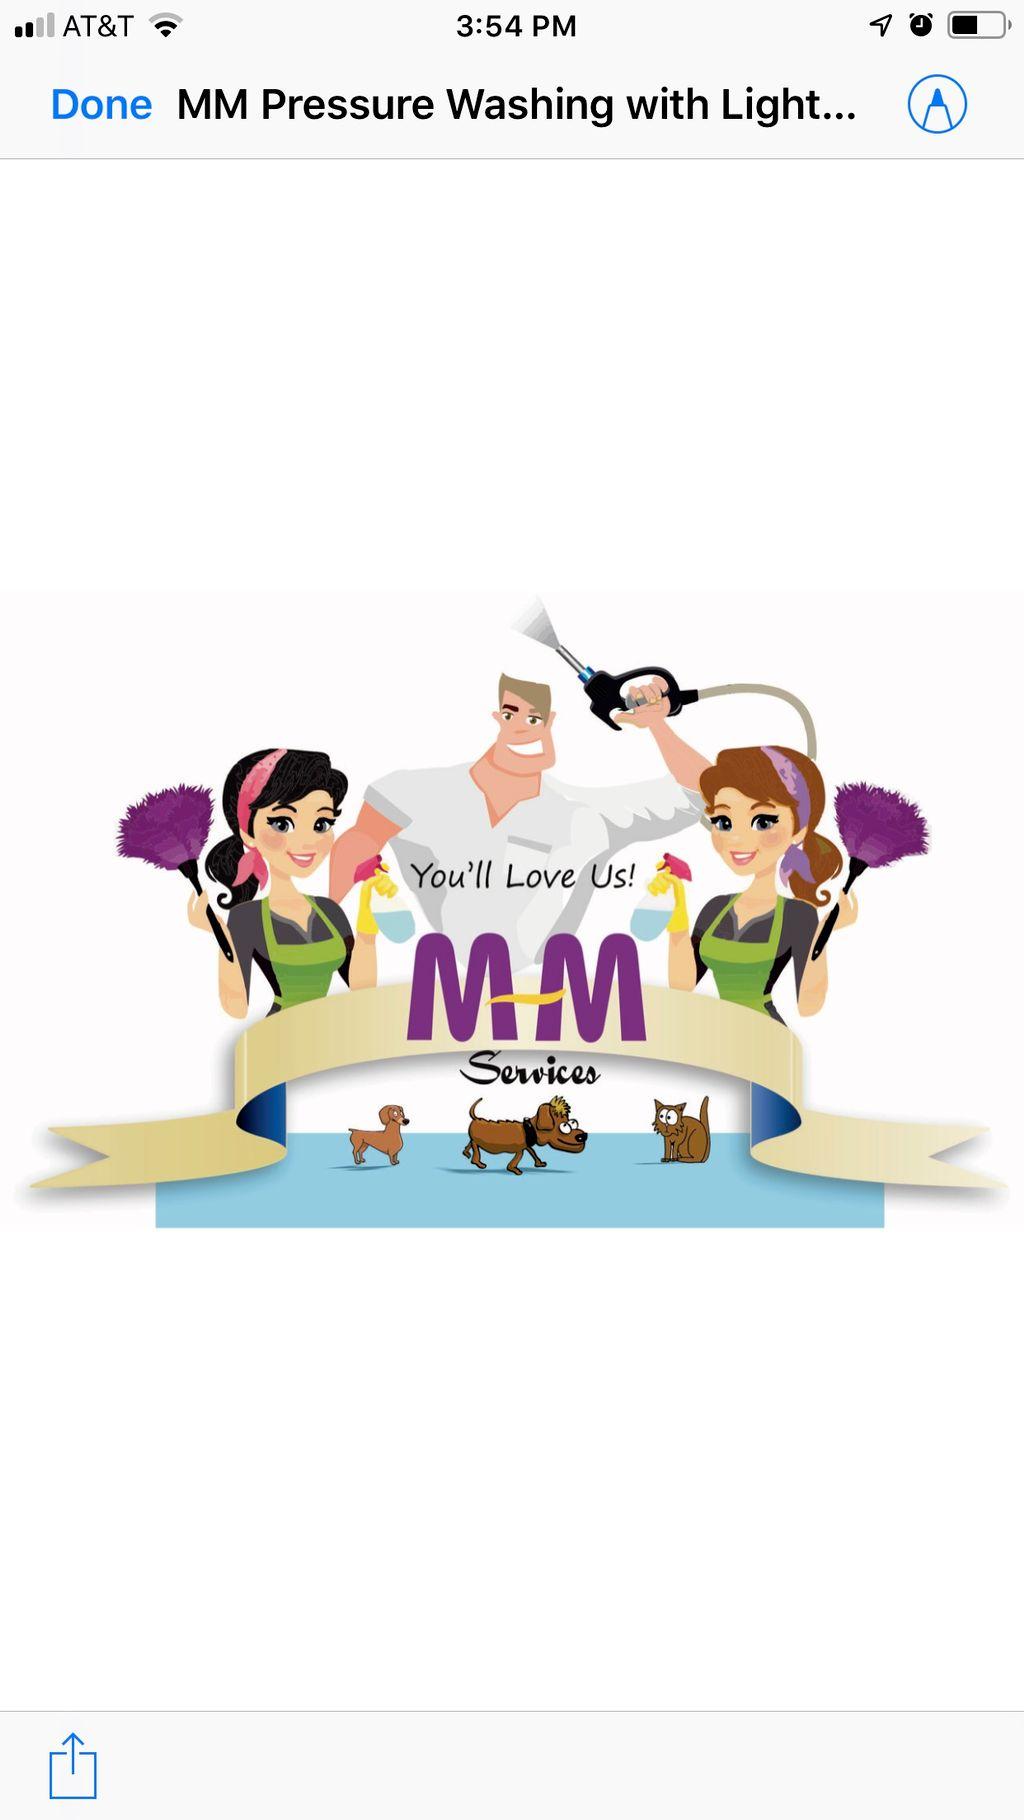 M-M Services LLC